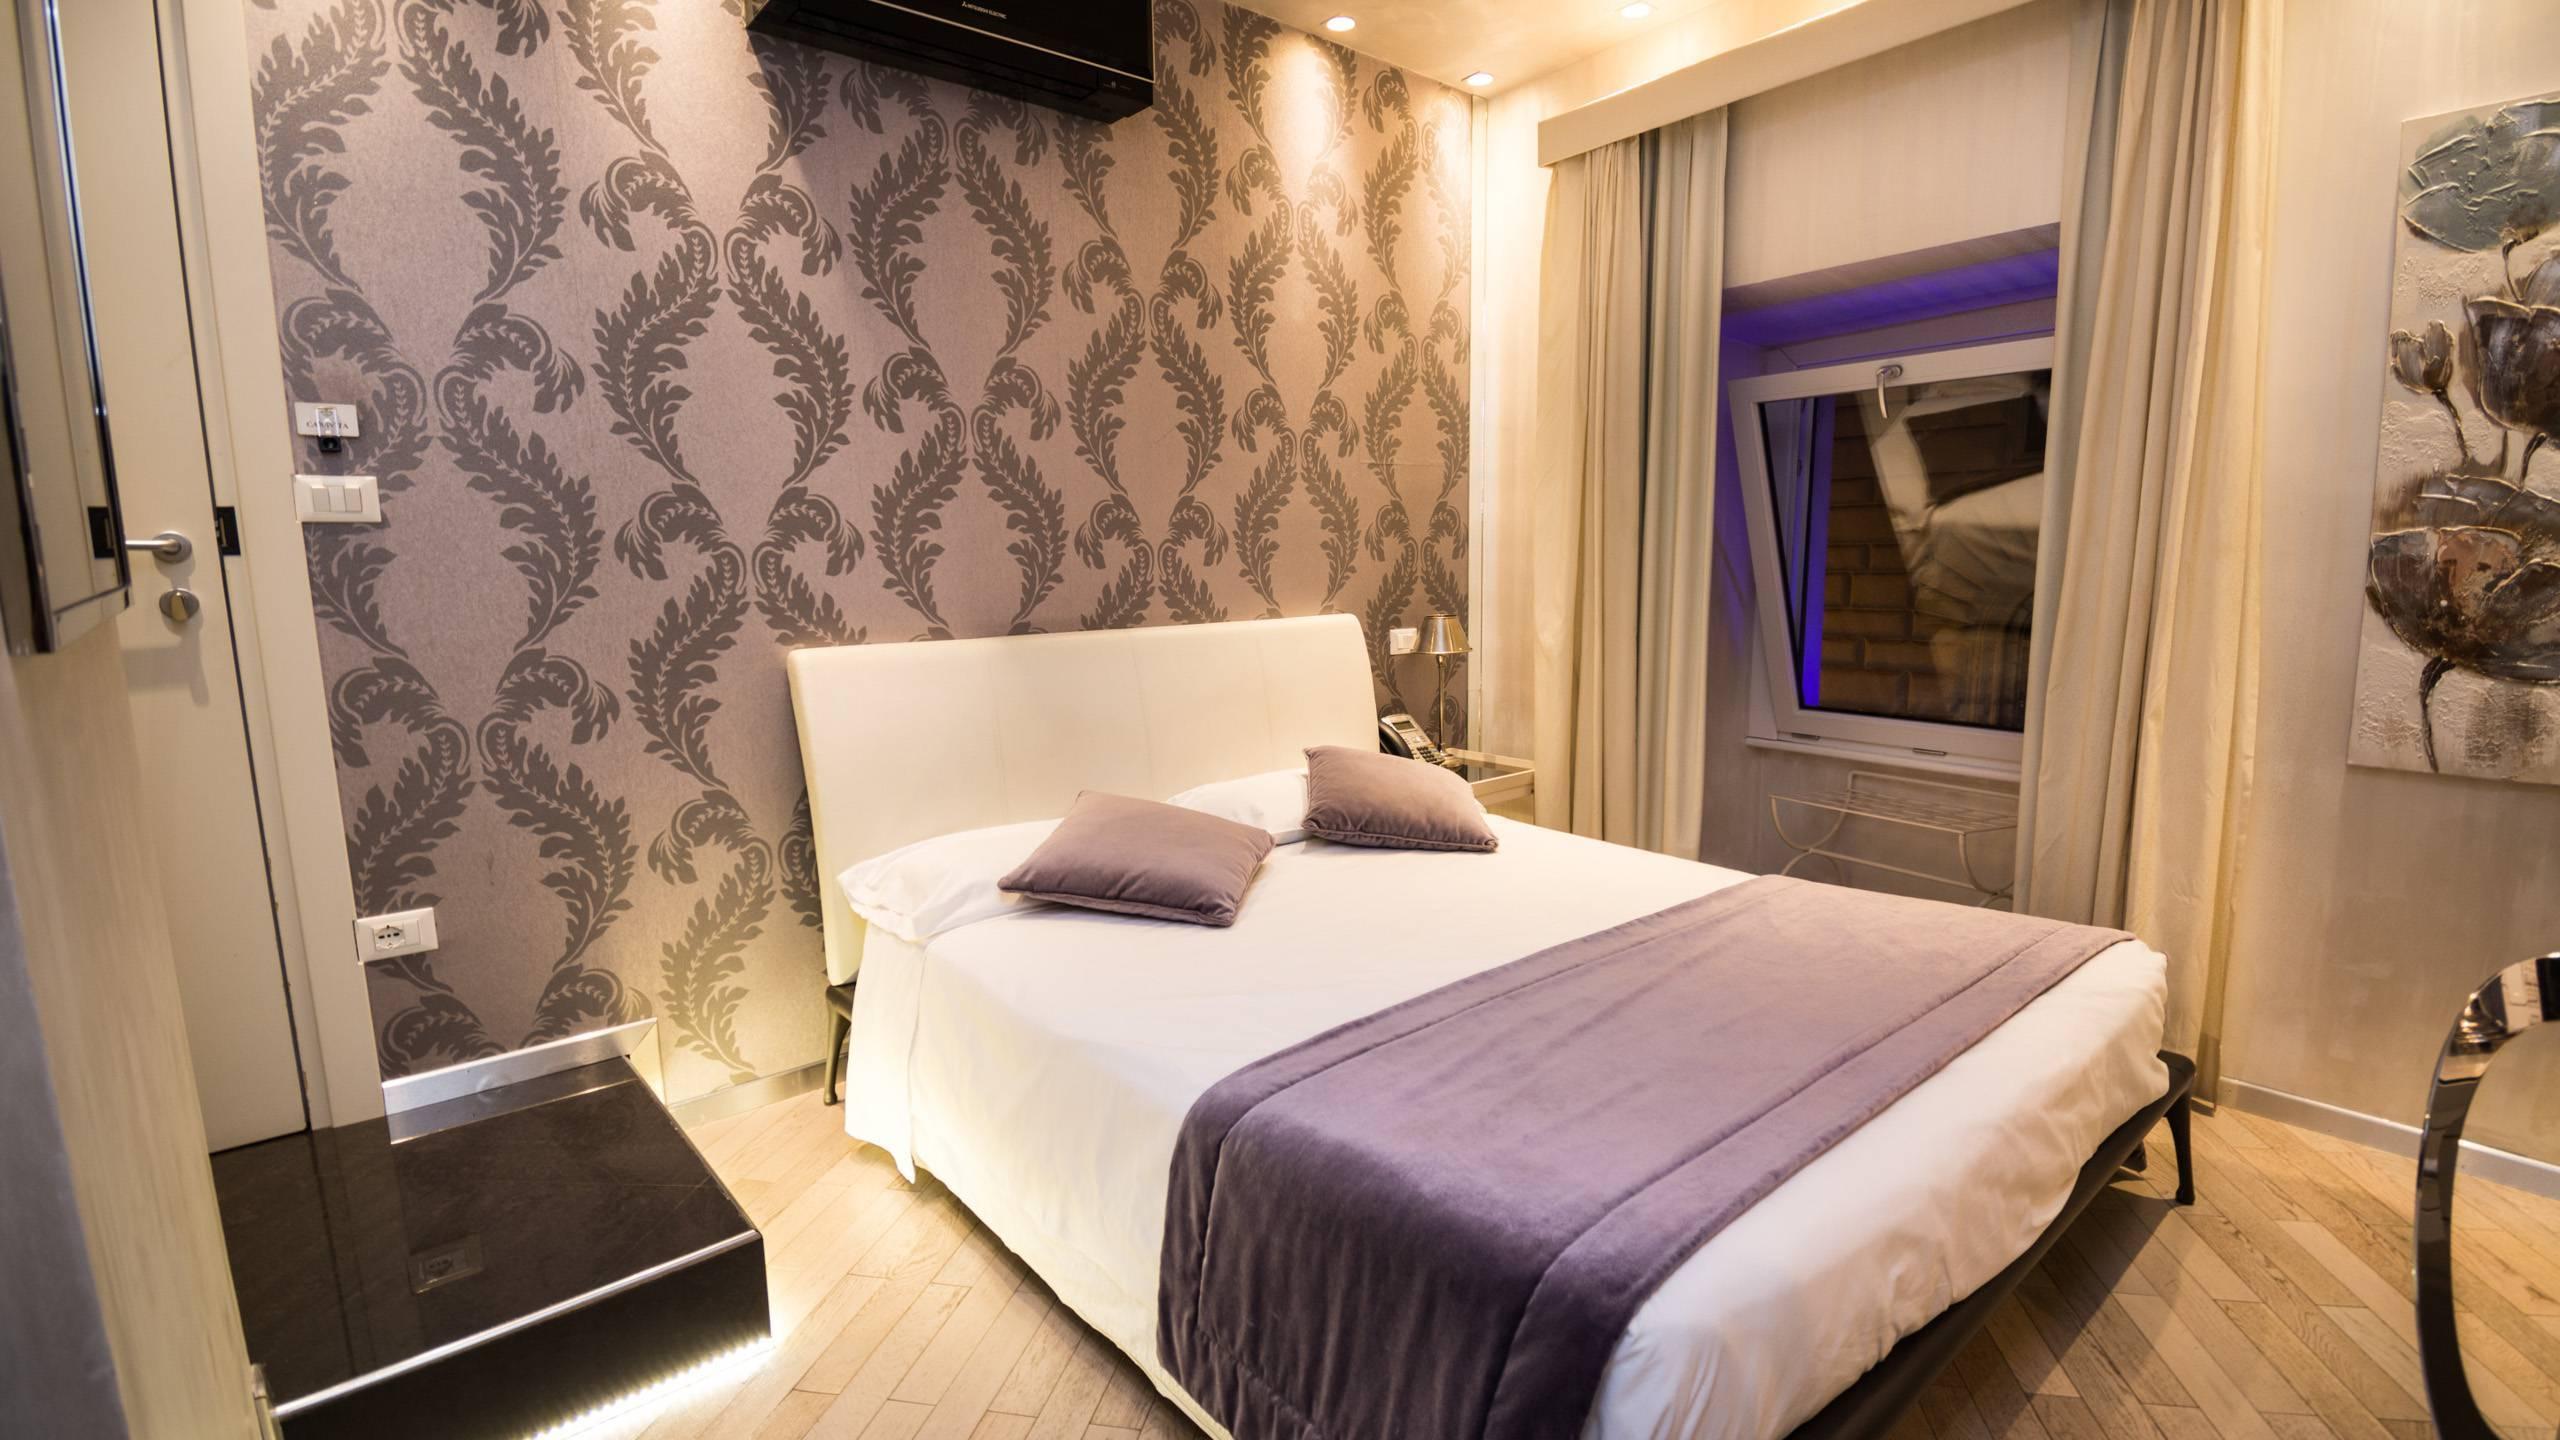 LBH-Hotel-Caravita-roma-camera-standard-8